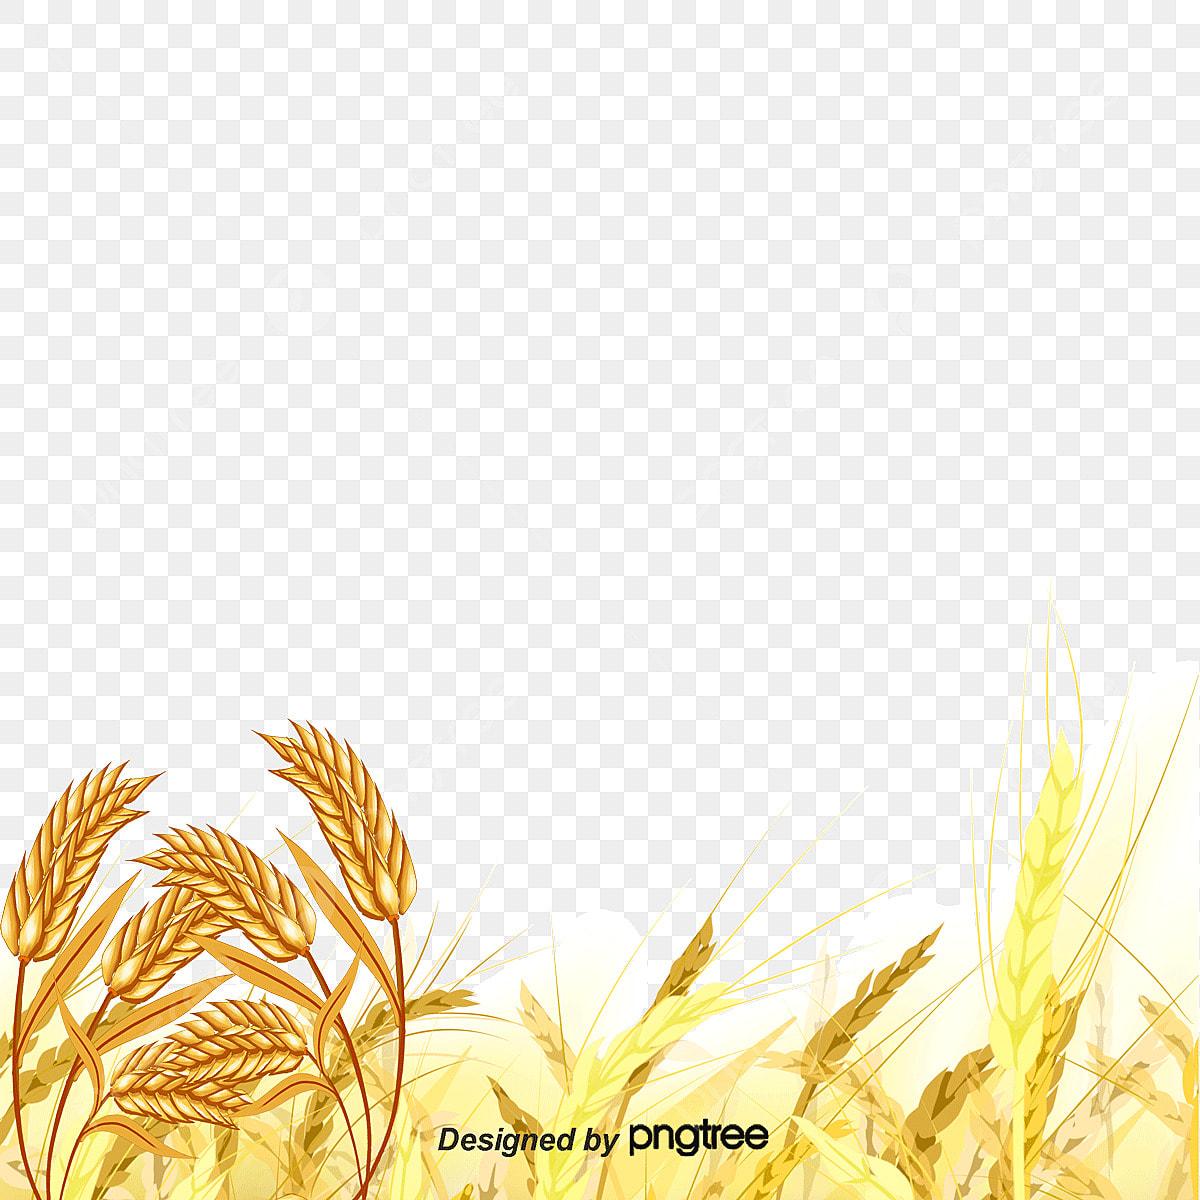 wheat field clipart - Clip Art Library